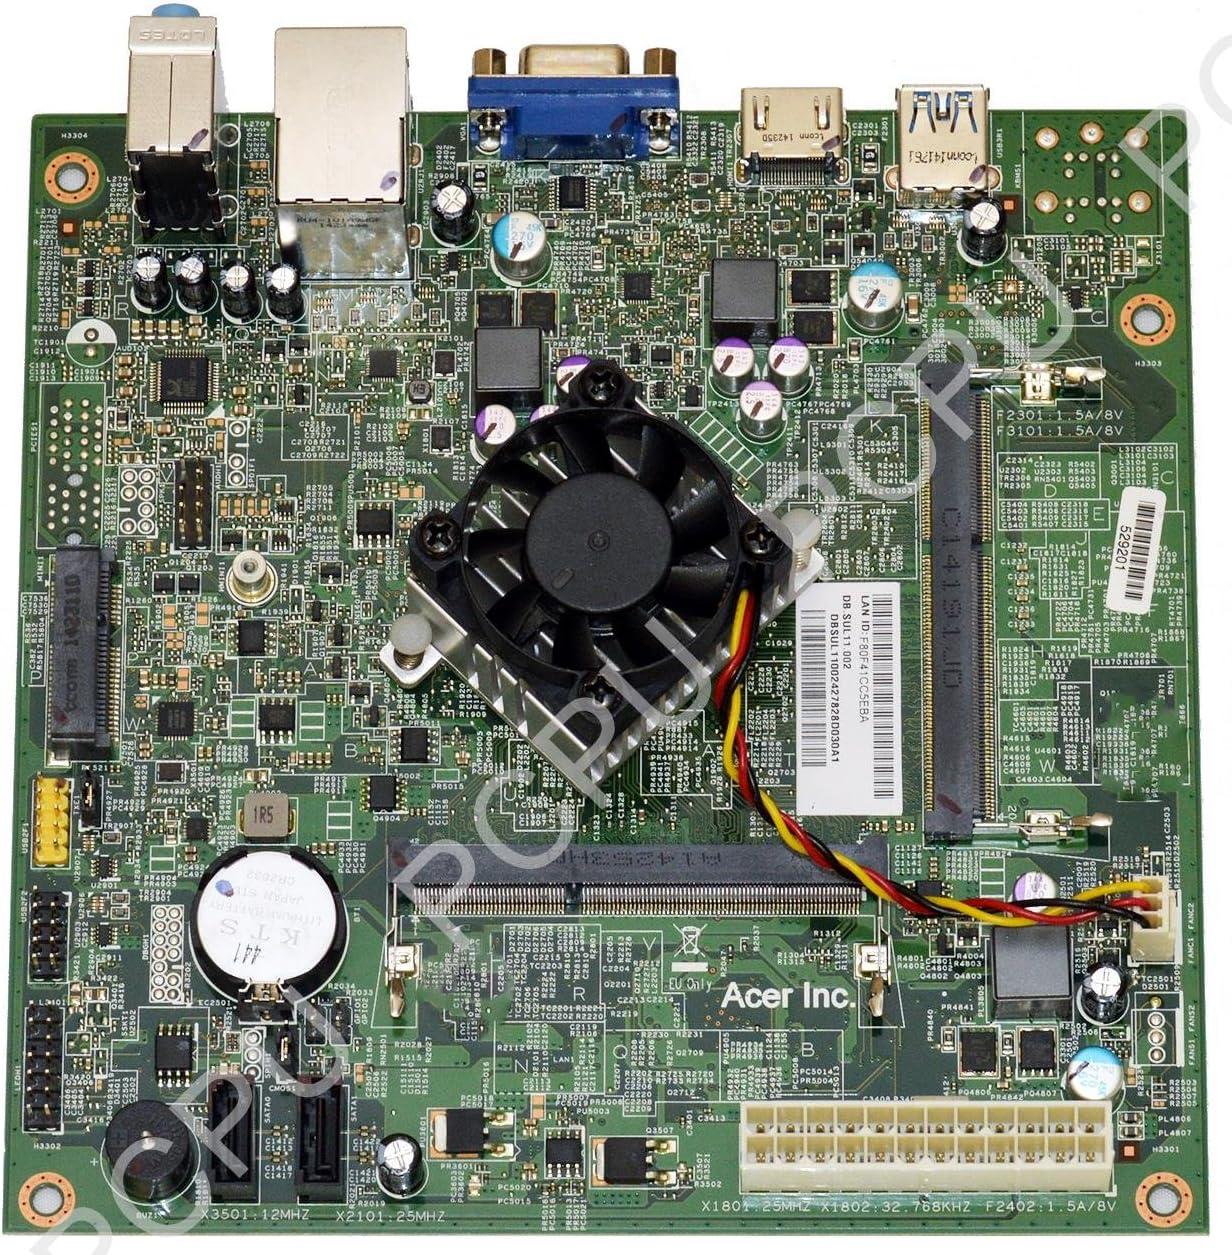 DB.SUL11.002 Acer Aspire AXC-603G Desktop Motherboard w/ Intel Celeron J1800 2.41Ghz CPU